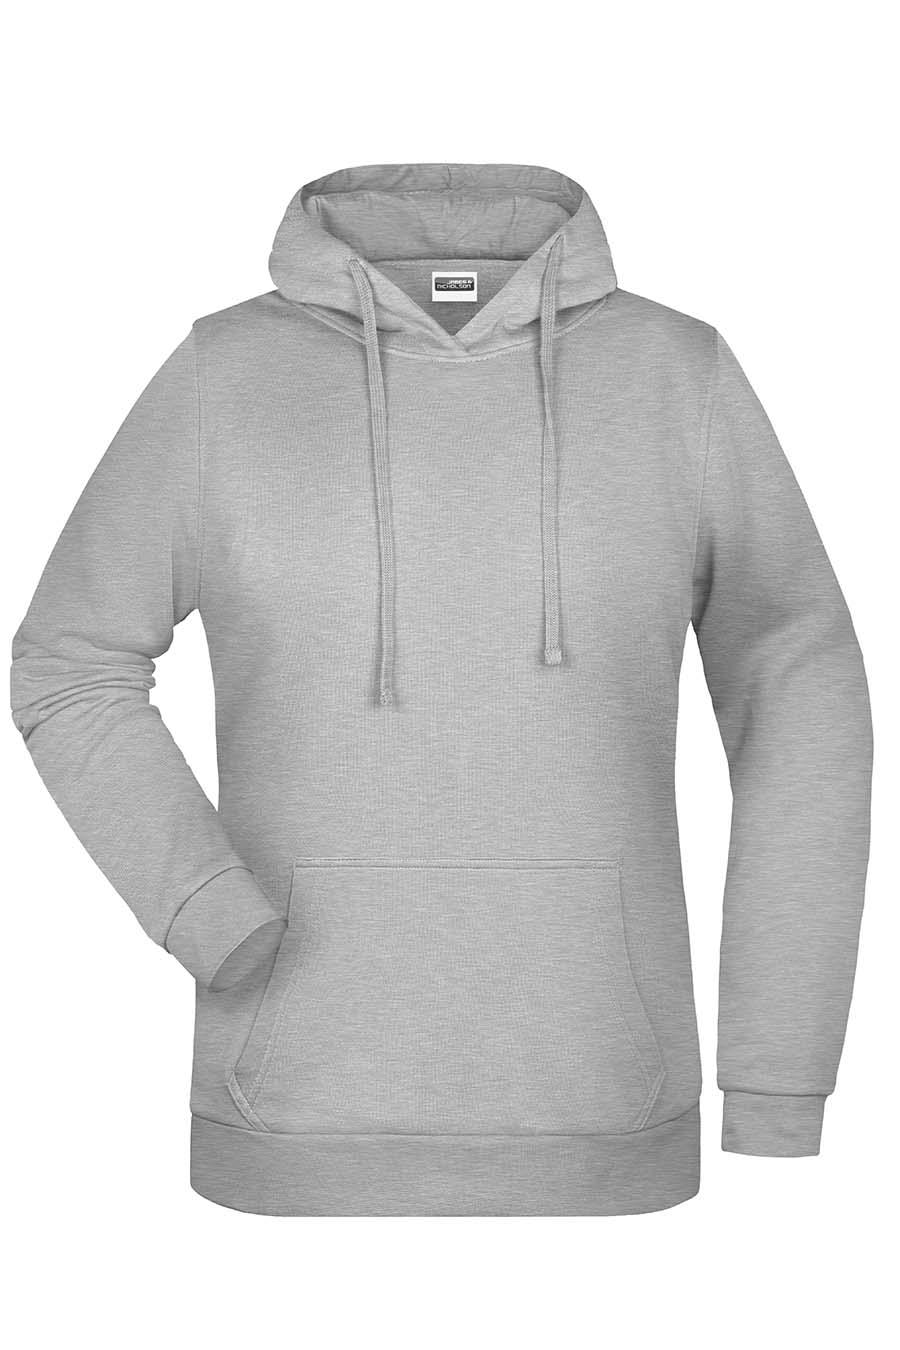 Sweat-shirt capuche femme - 20-1494-9